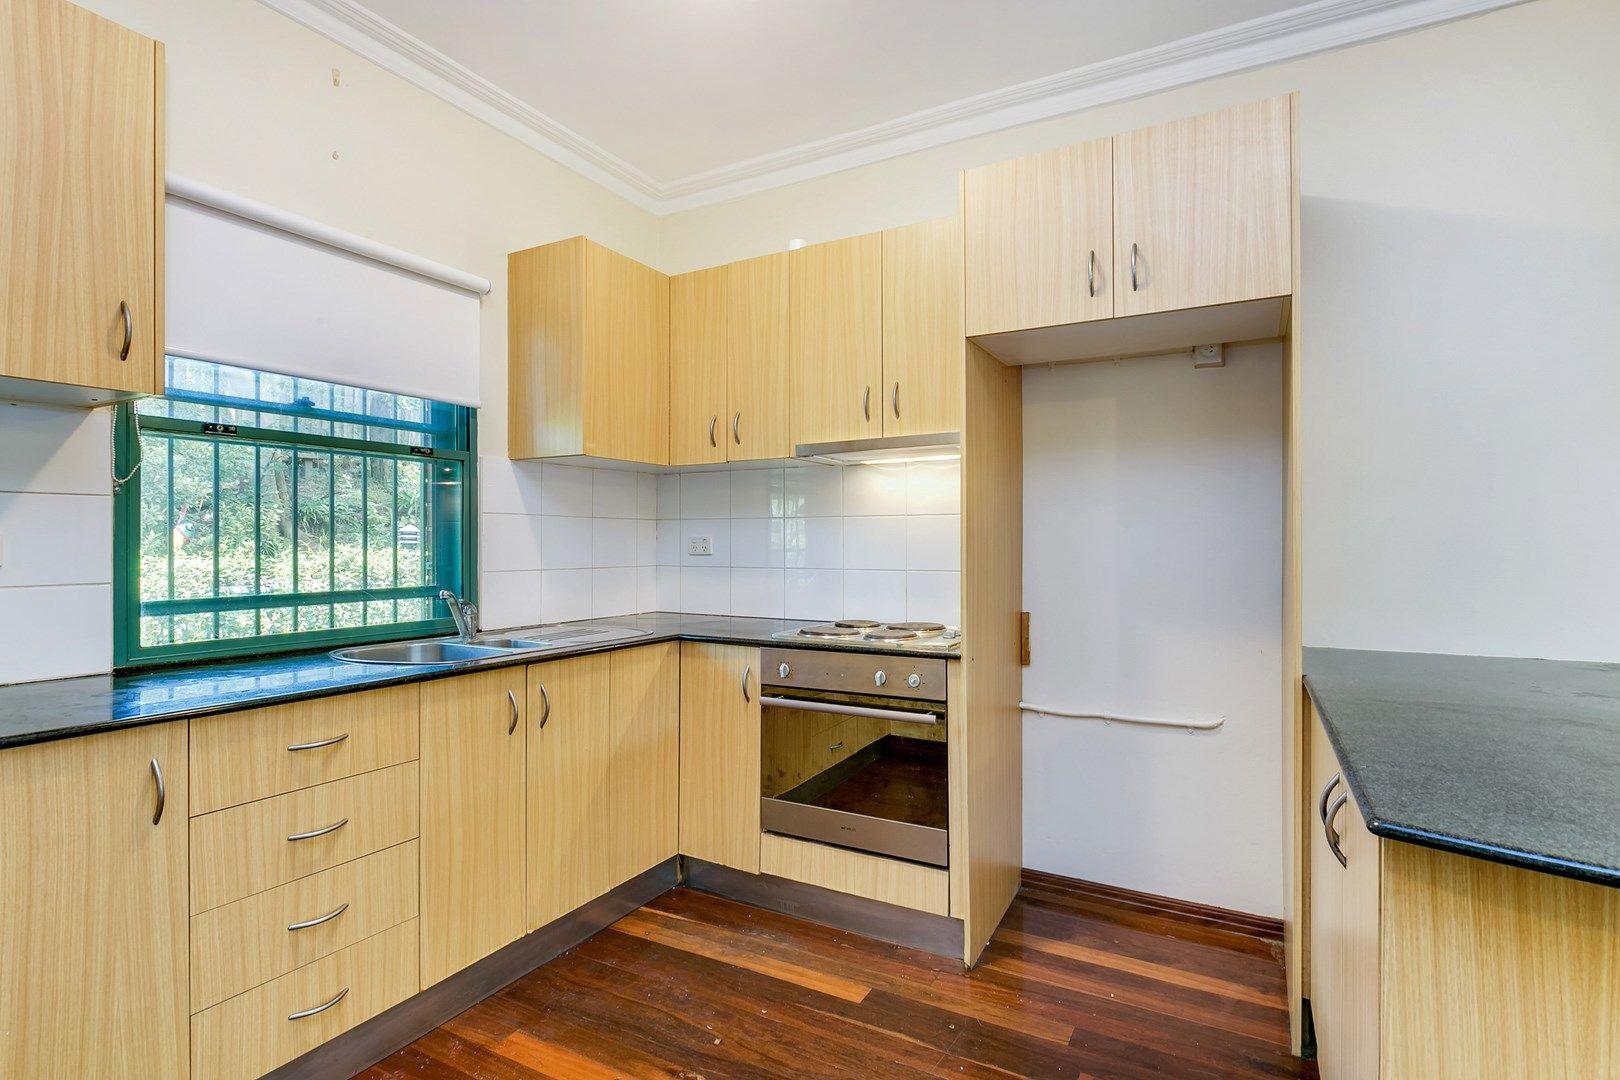 13/45 Macdonald Street, Erskineville NSW 2043, Image 0